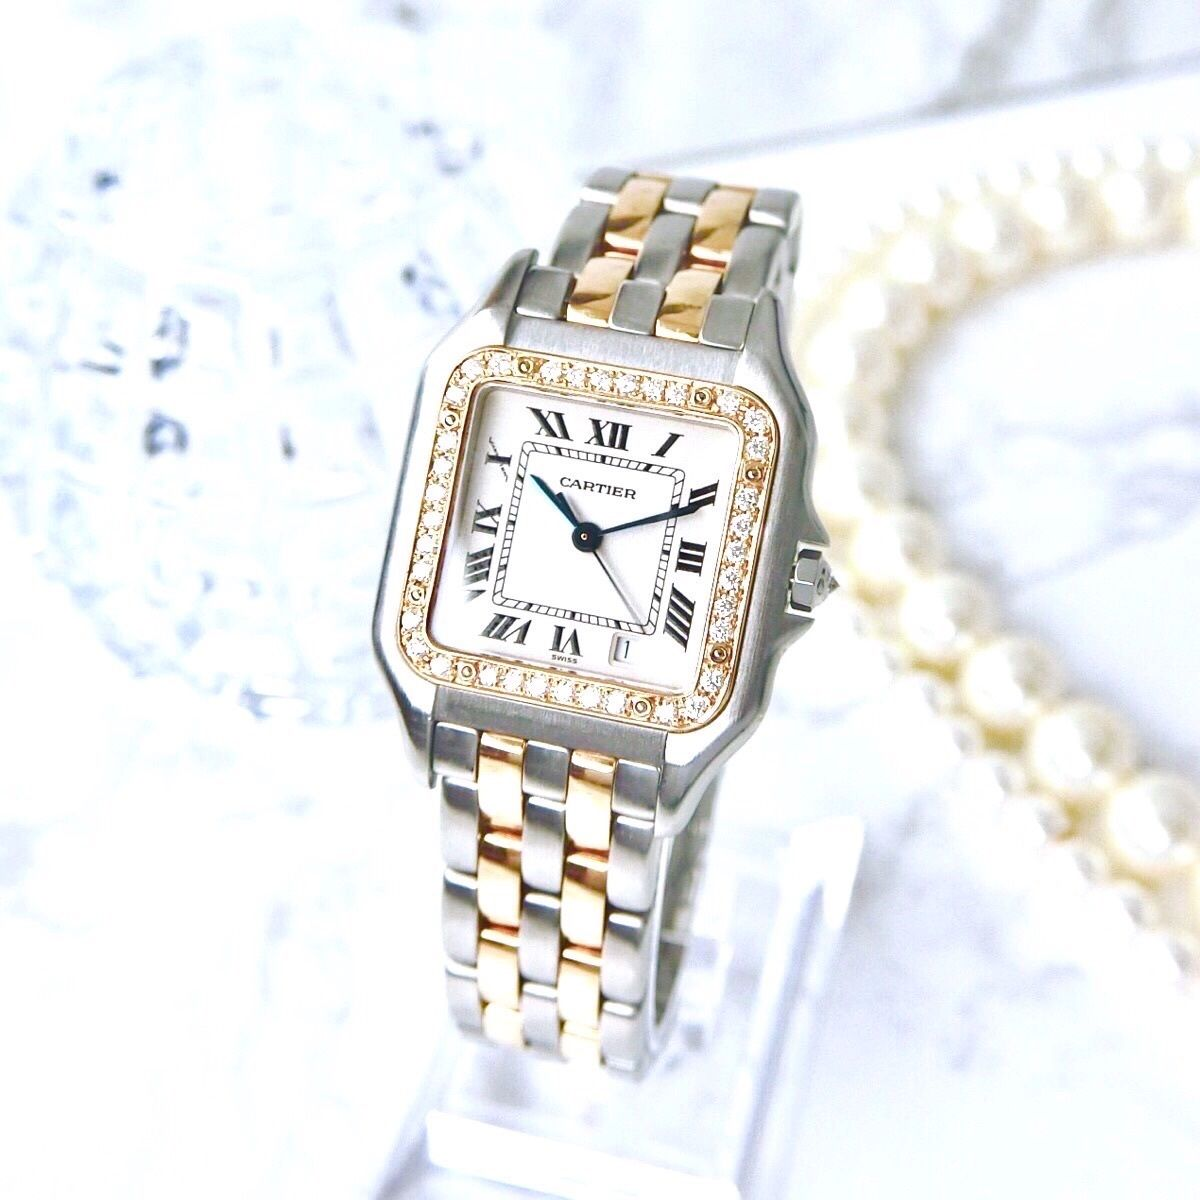 Cartier カルティエ パンテール   MM K18コンビ 37P 天然ダイヤモンド クォーツ レディース 腕時計